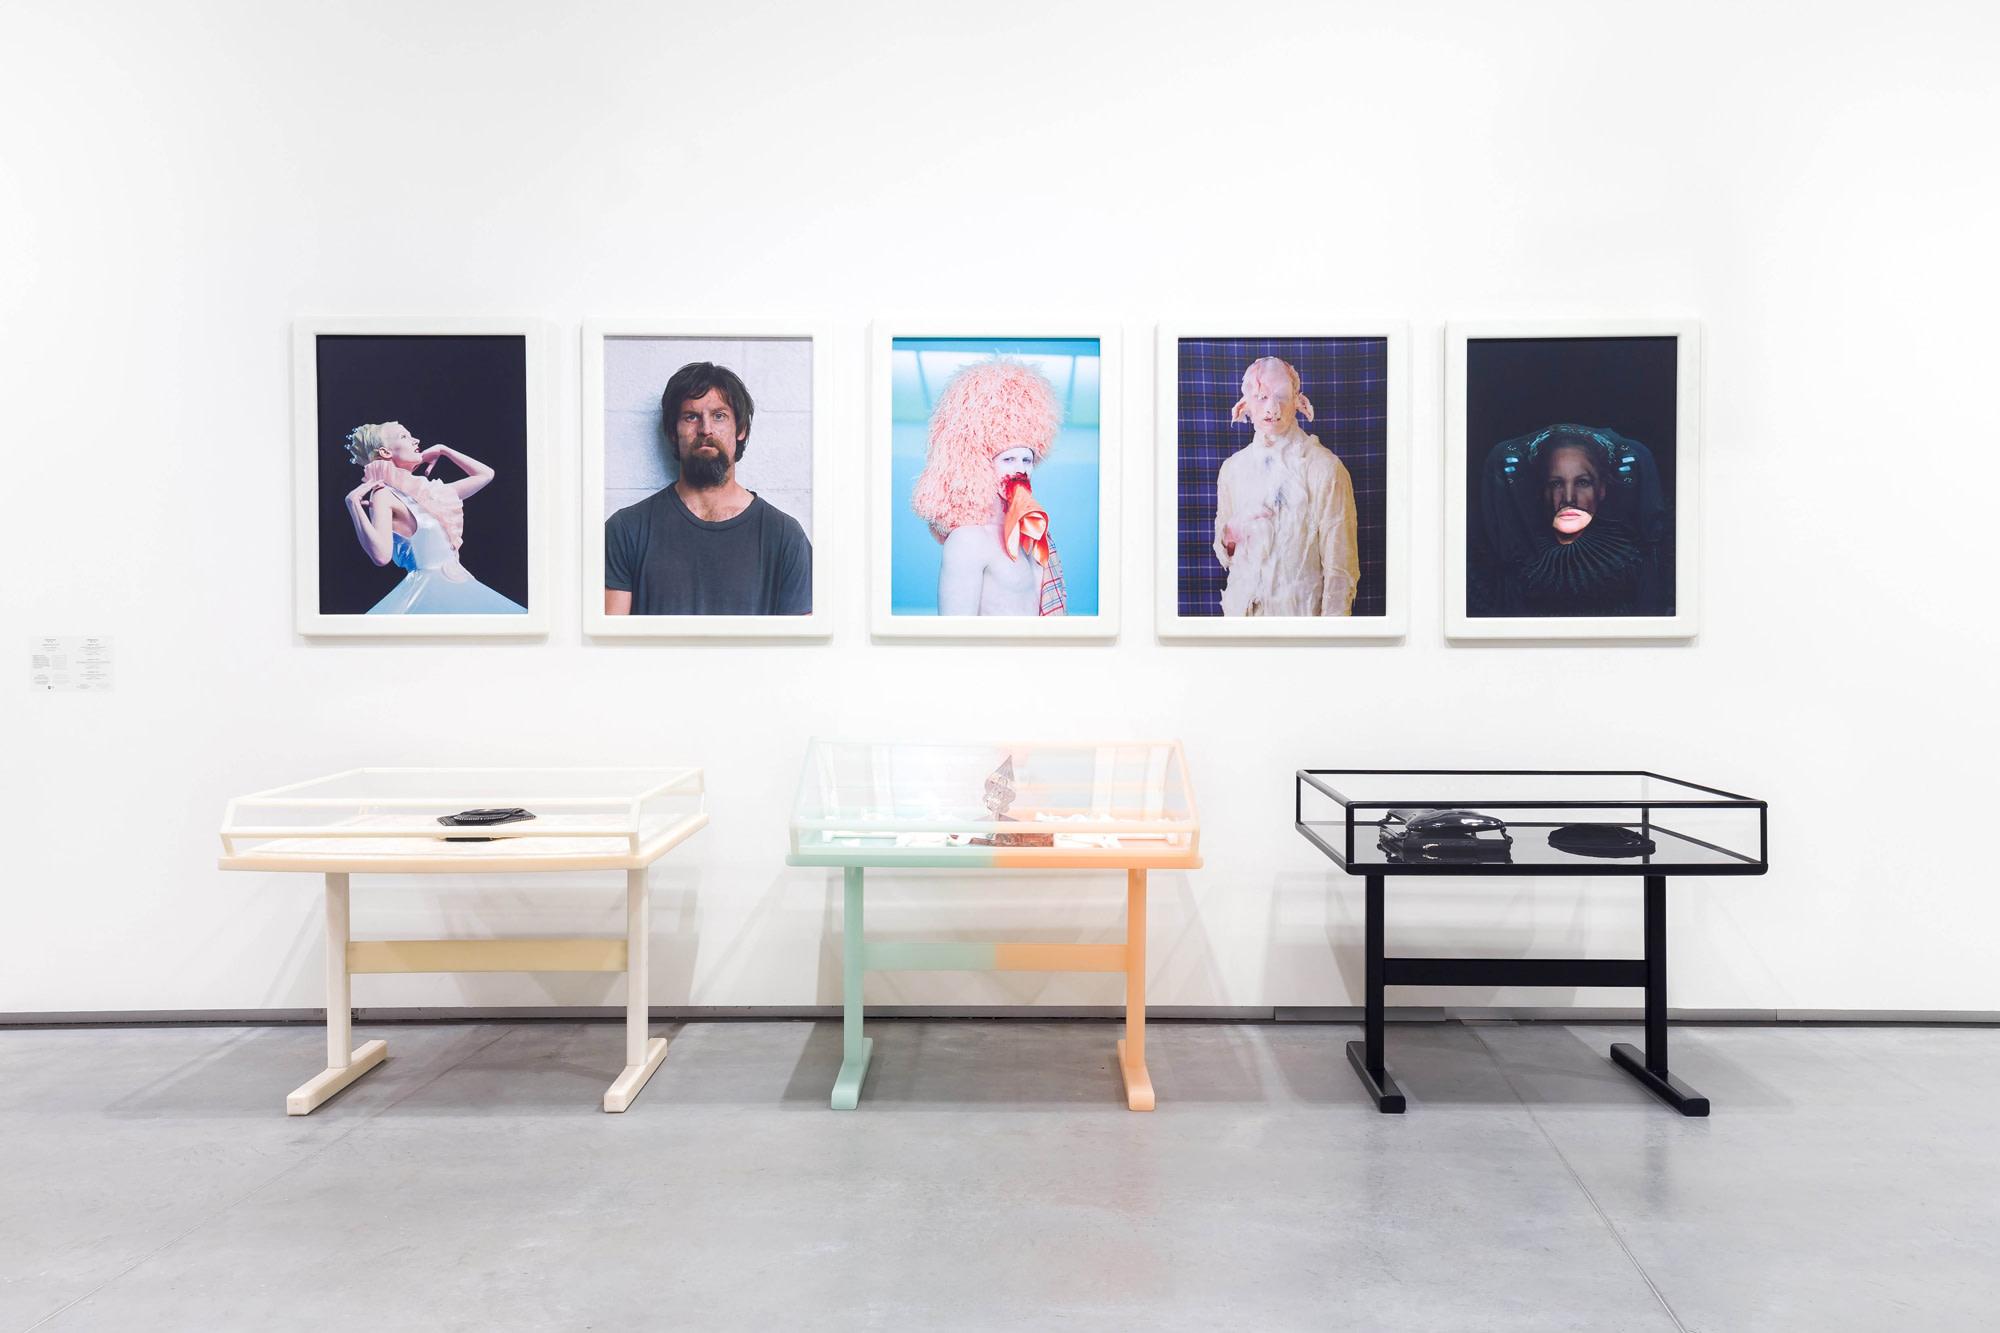 <p>Installation view, <em>Bildungsroman</em>, Astrup Fearnley Museum, Oslo, 26 February - 15 May 2016</p>